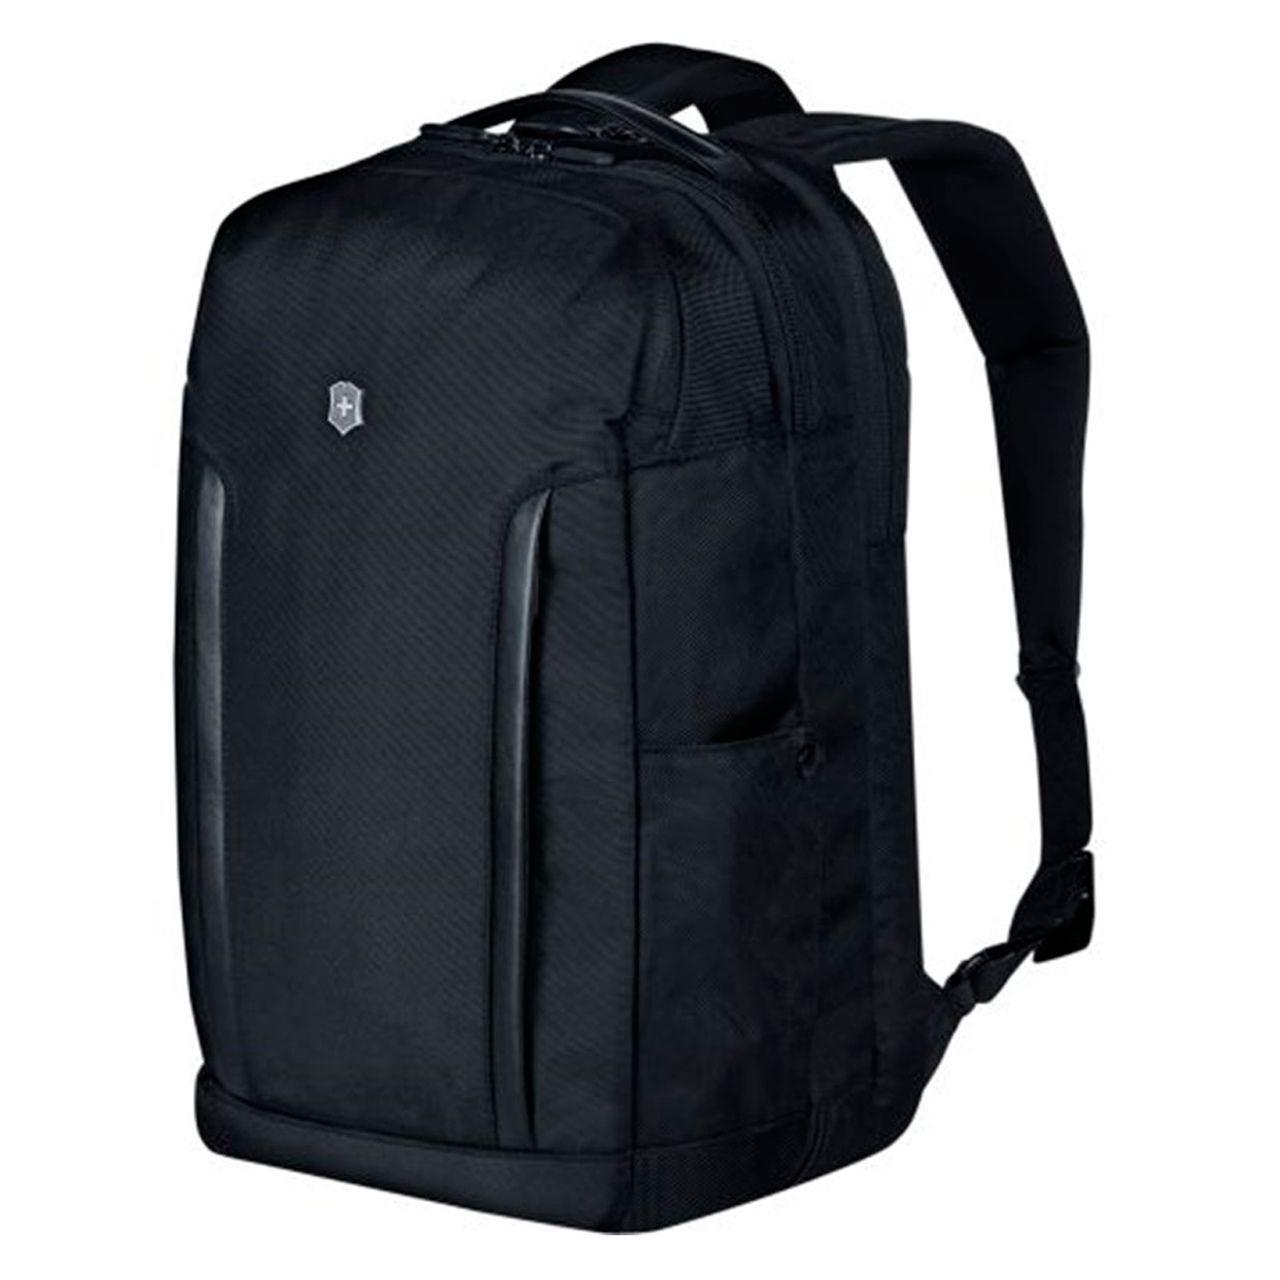 Mochila Altmont Professional Deluxe Laptop - Victorinox - Preta